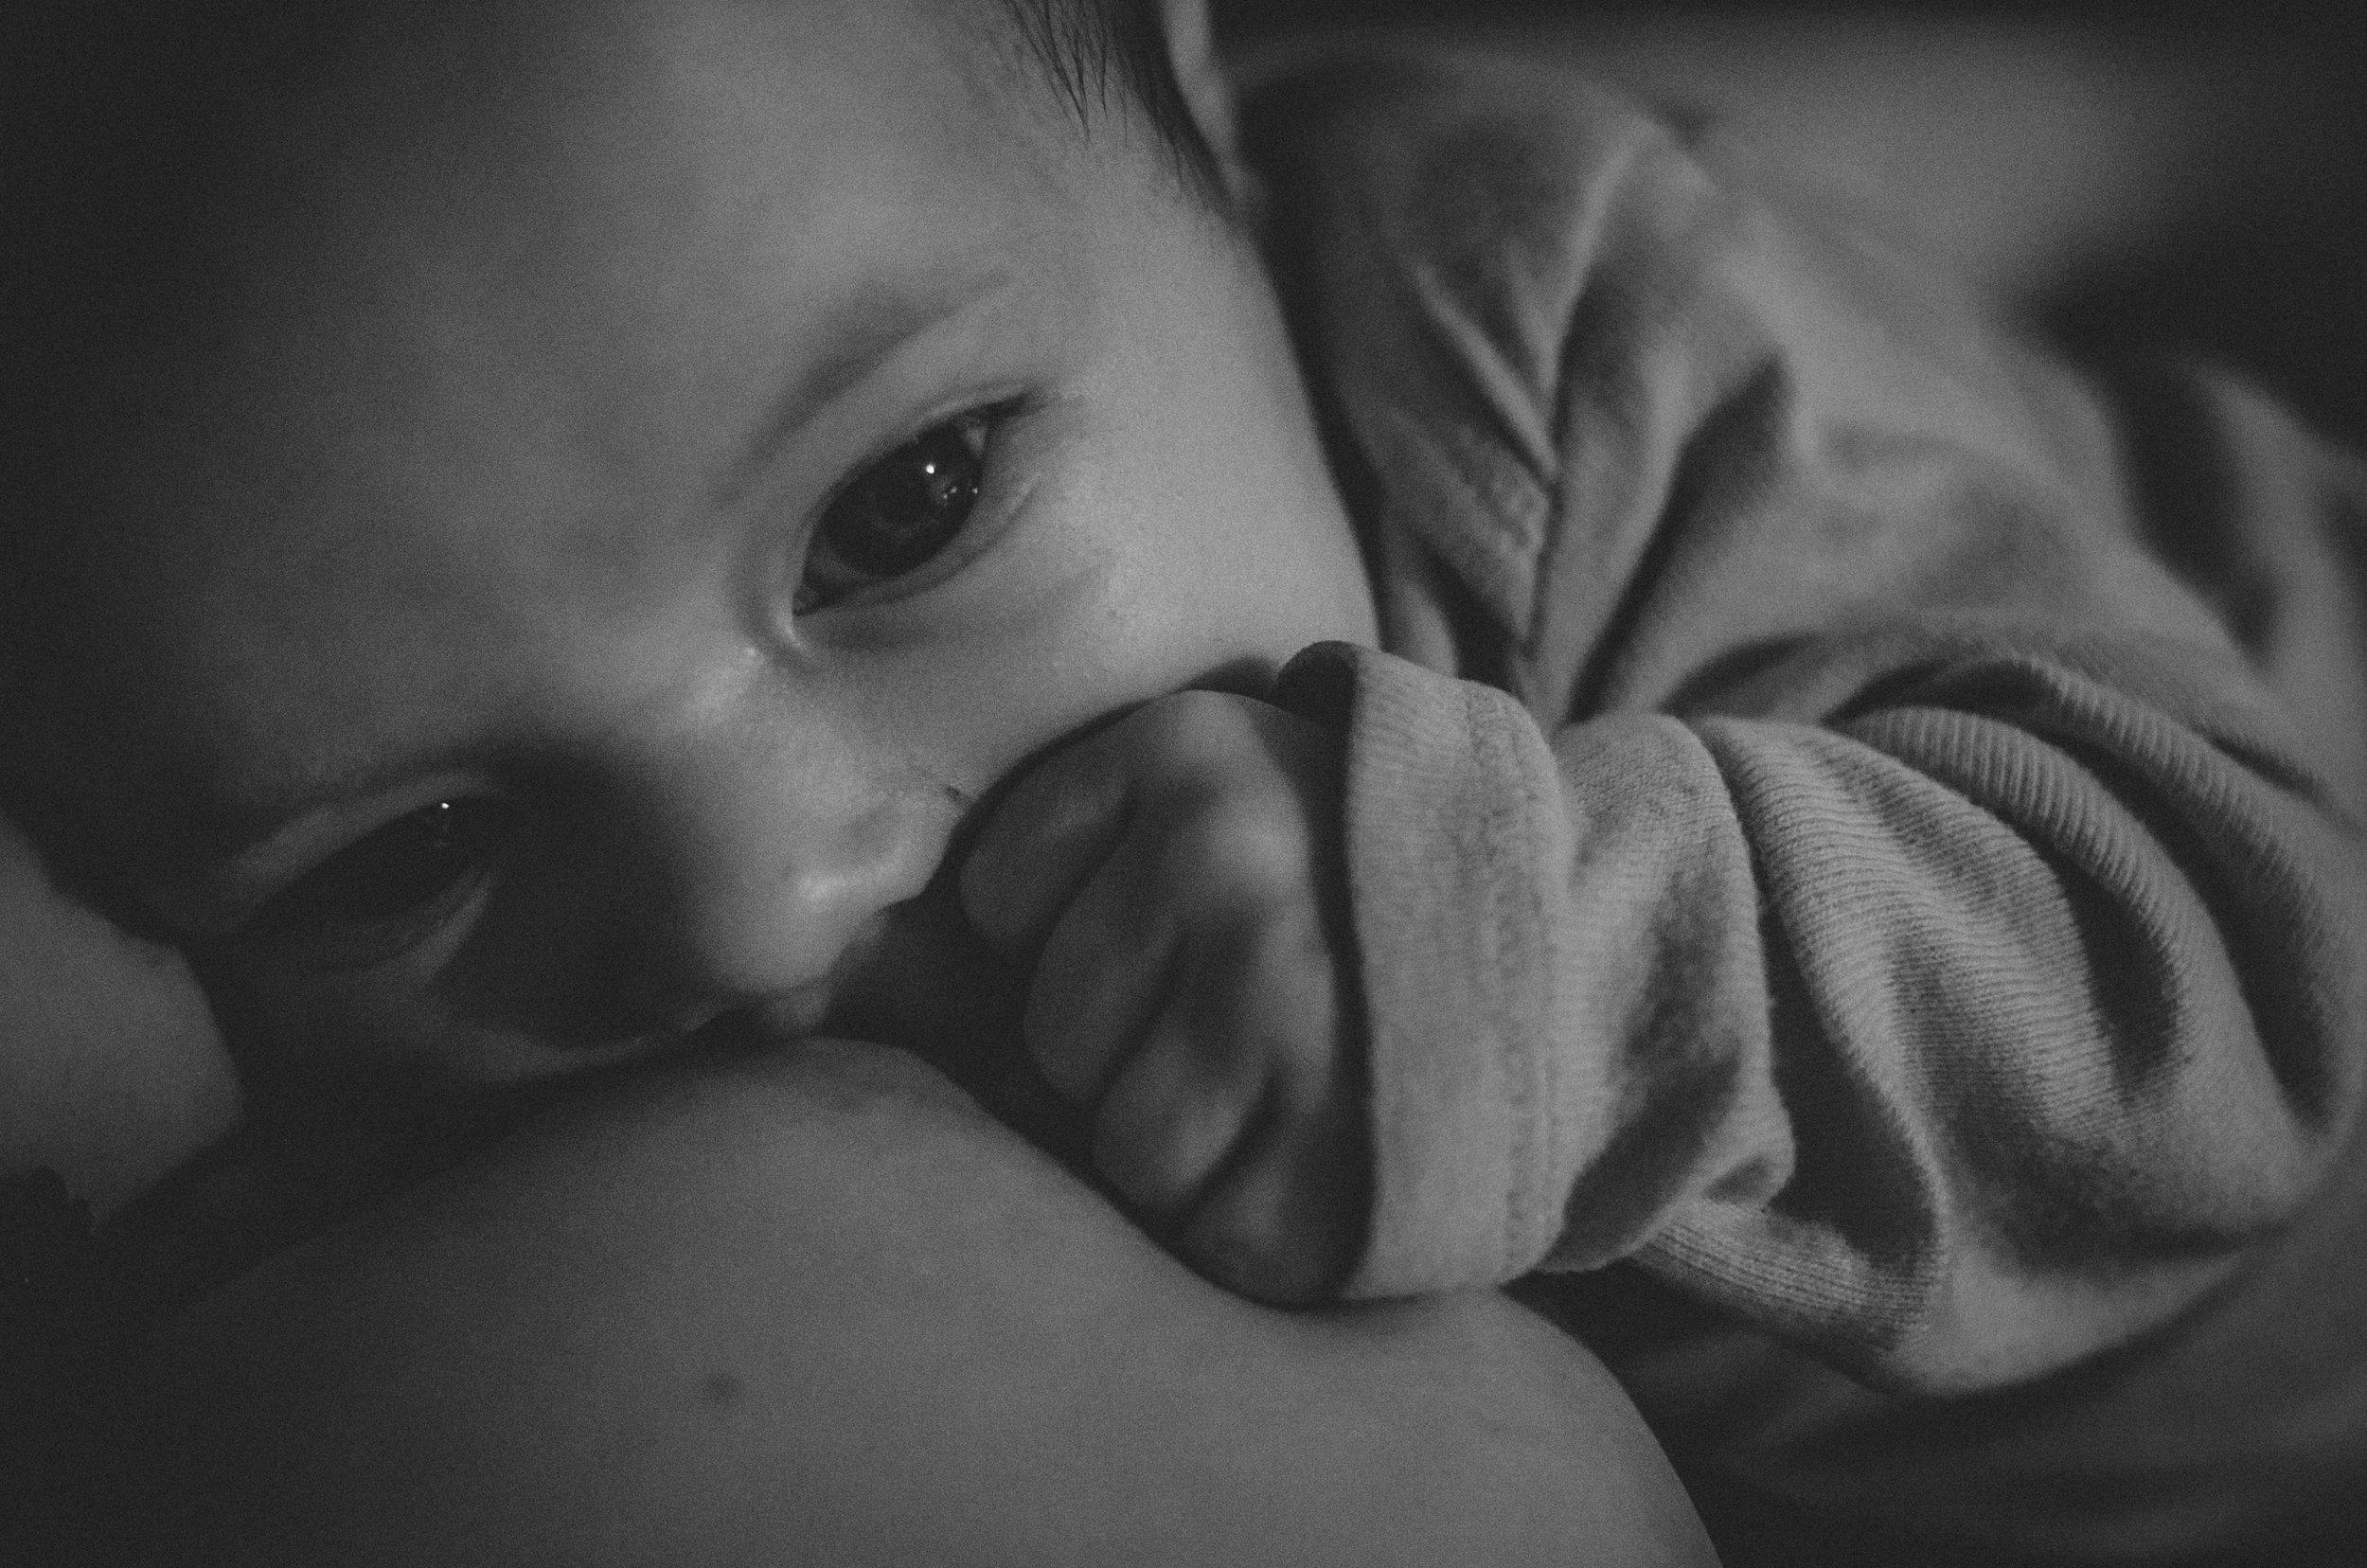 calm baby, boob juice, mamas milk, breastfeeding photo